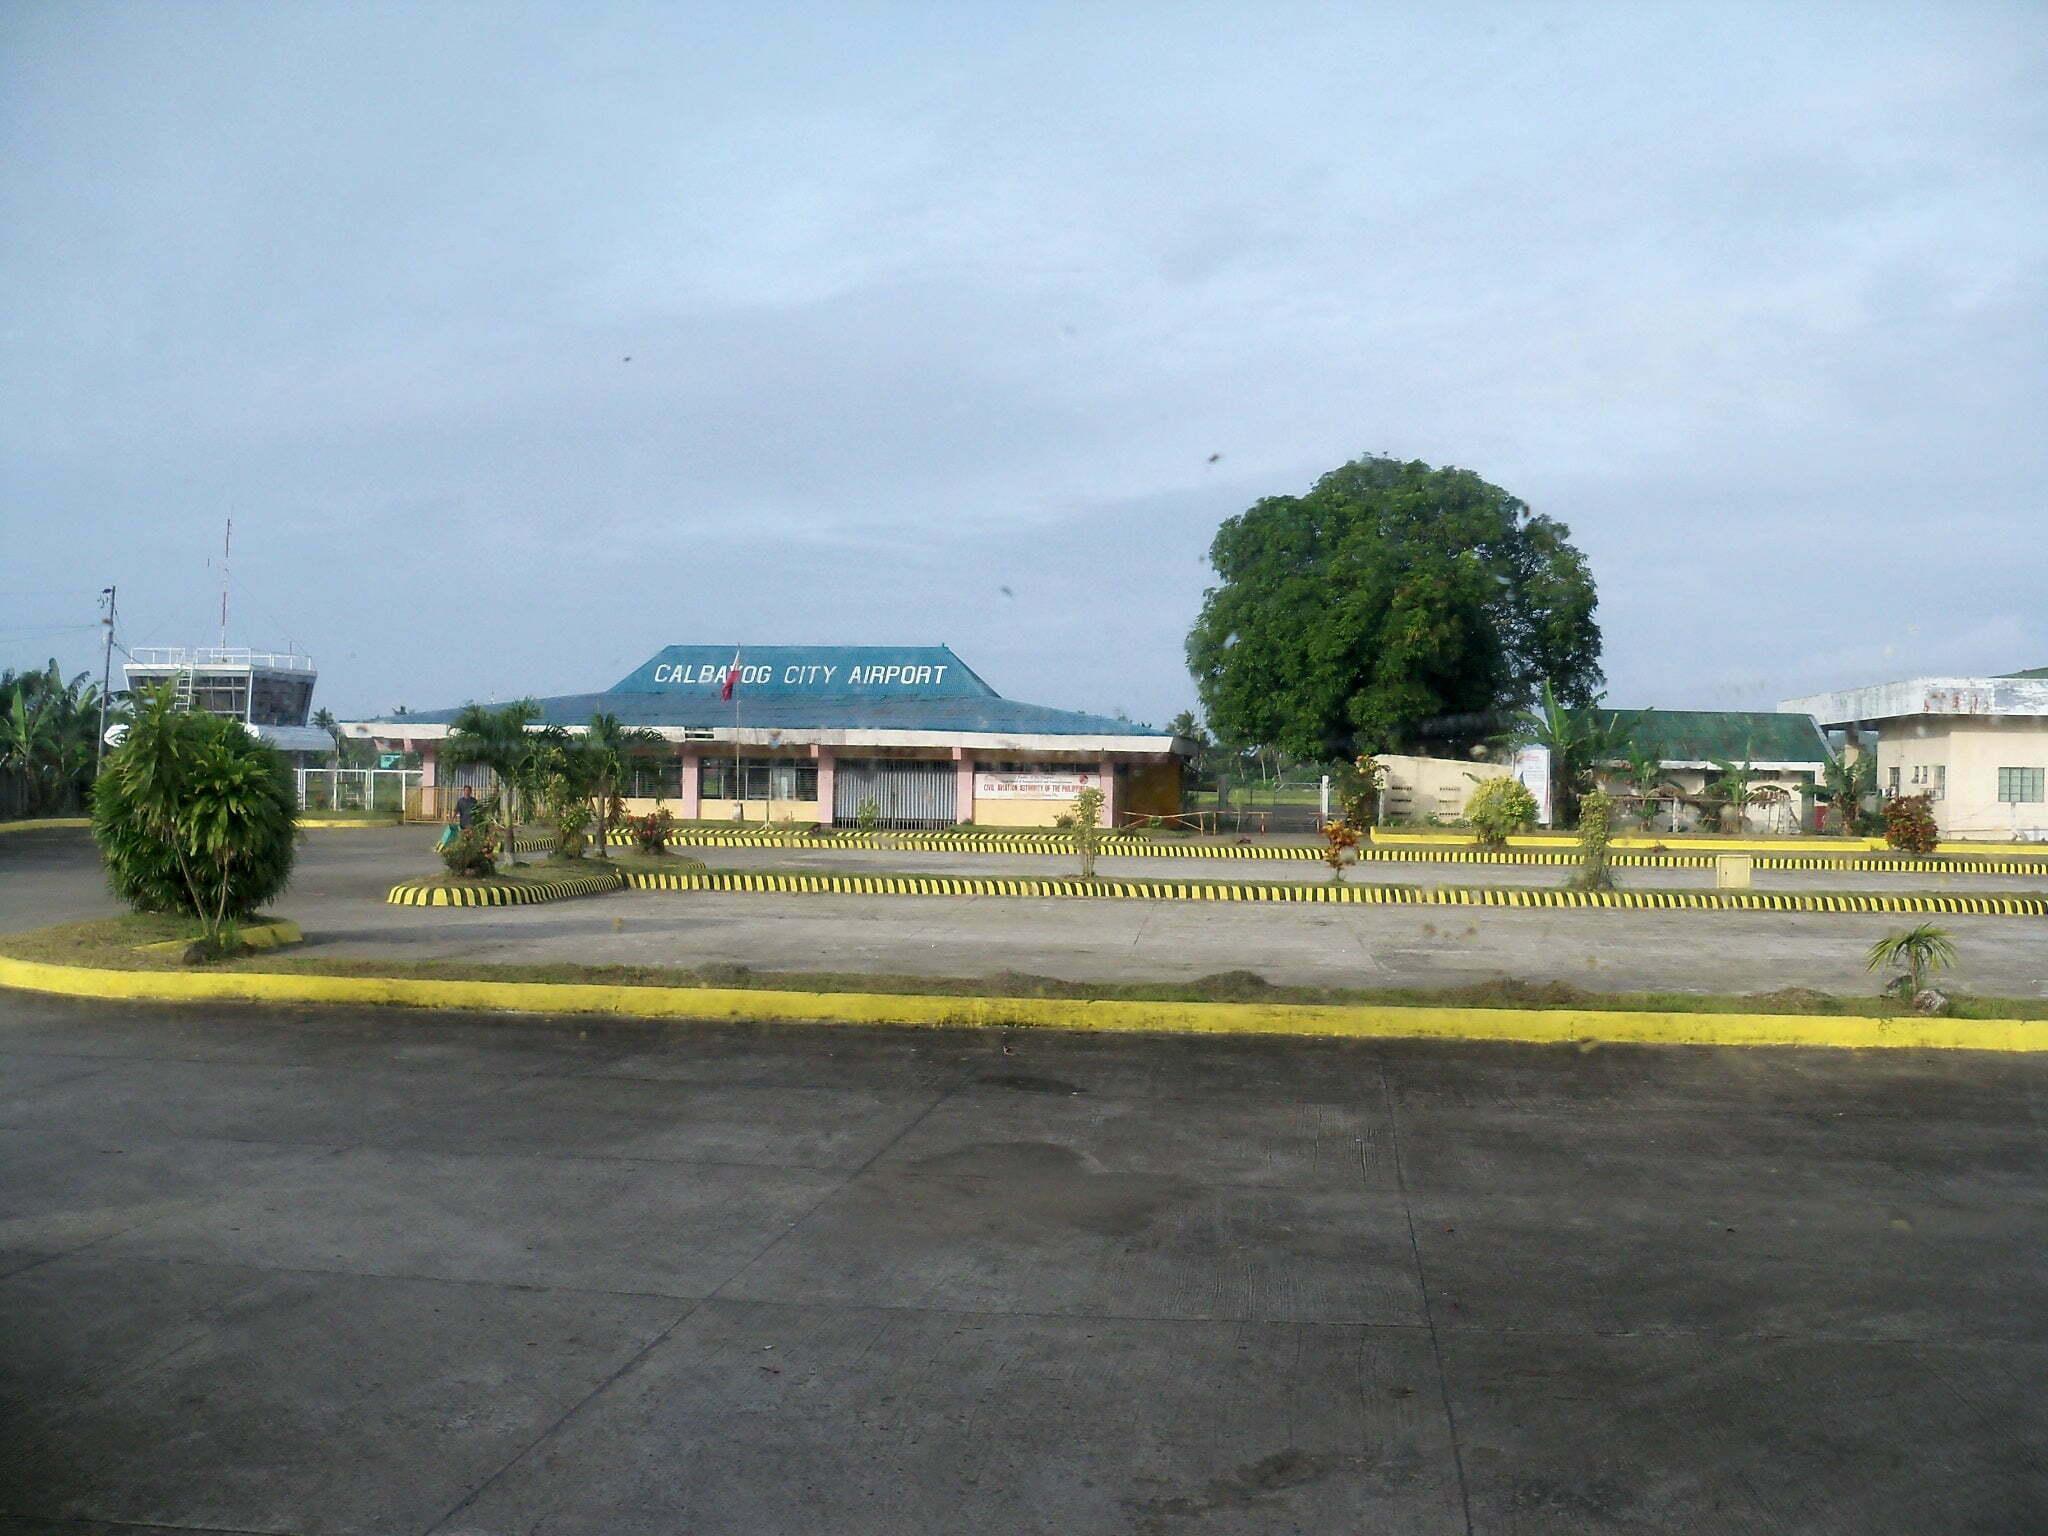 Tacloban (and Calbayog) Airport Terminal Fee Raised